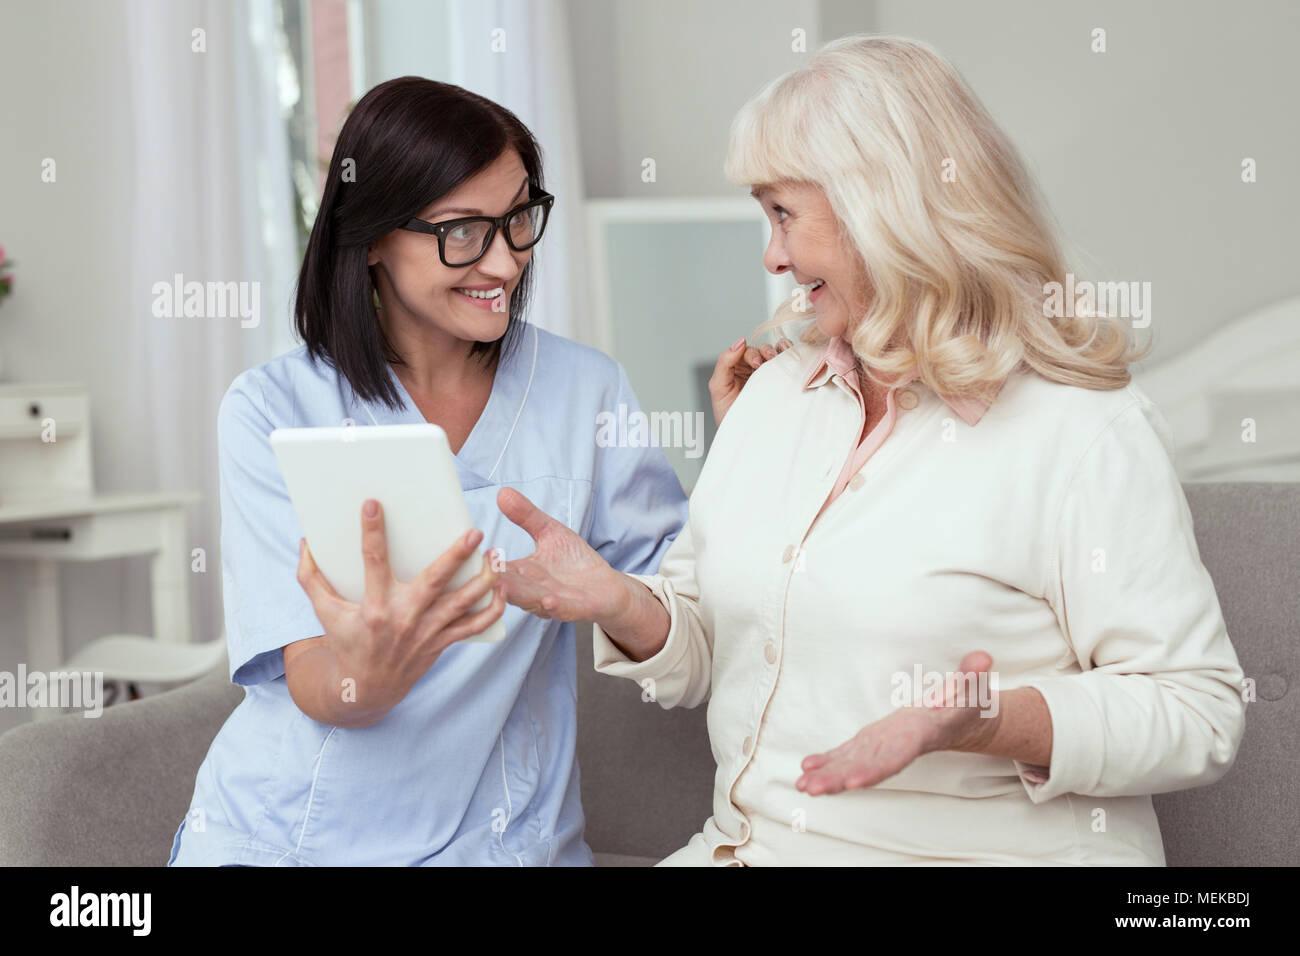 Joyful elder woman learning tablet usage - Stock Image